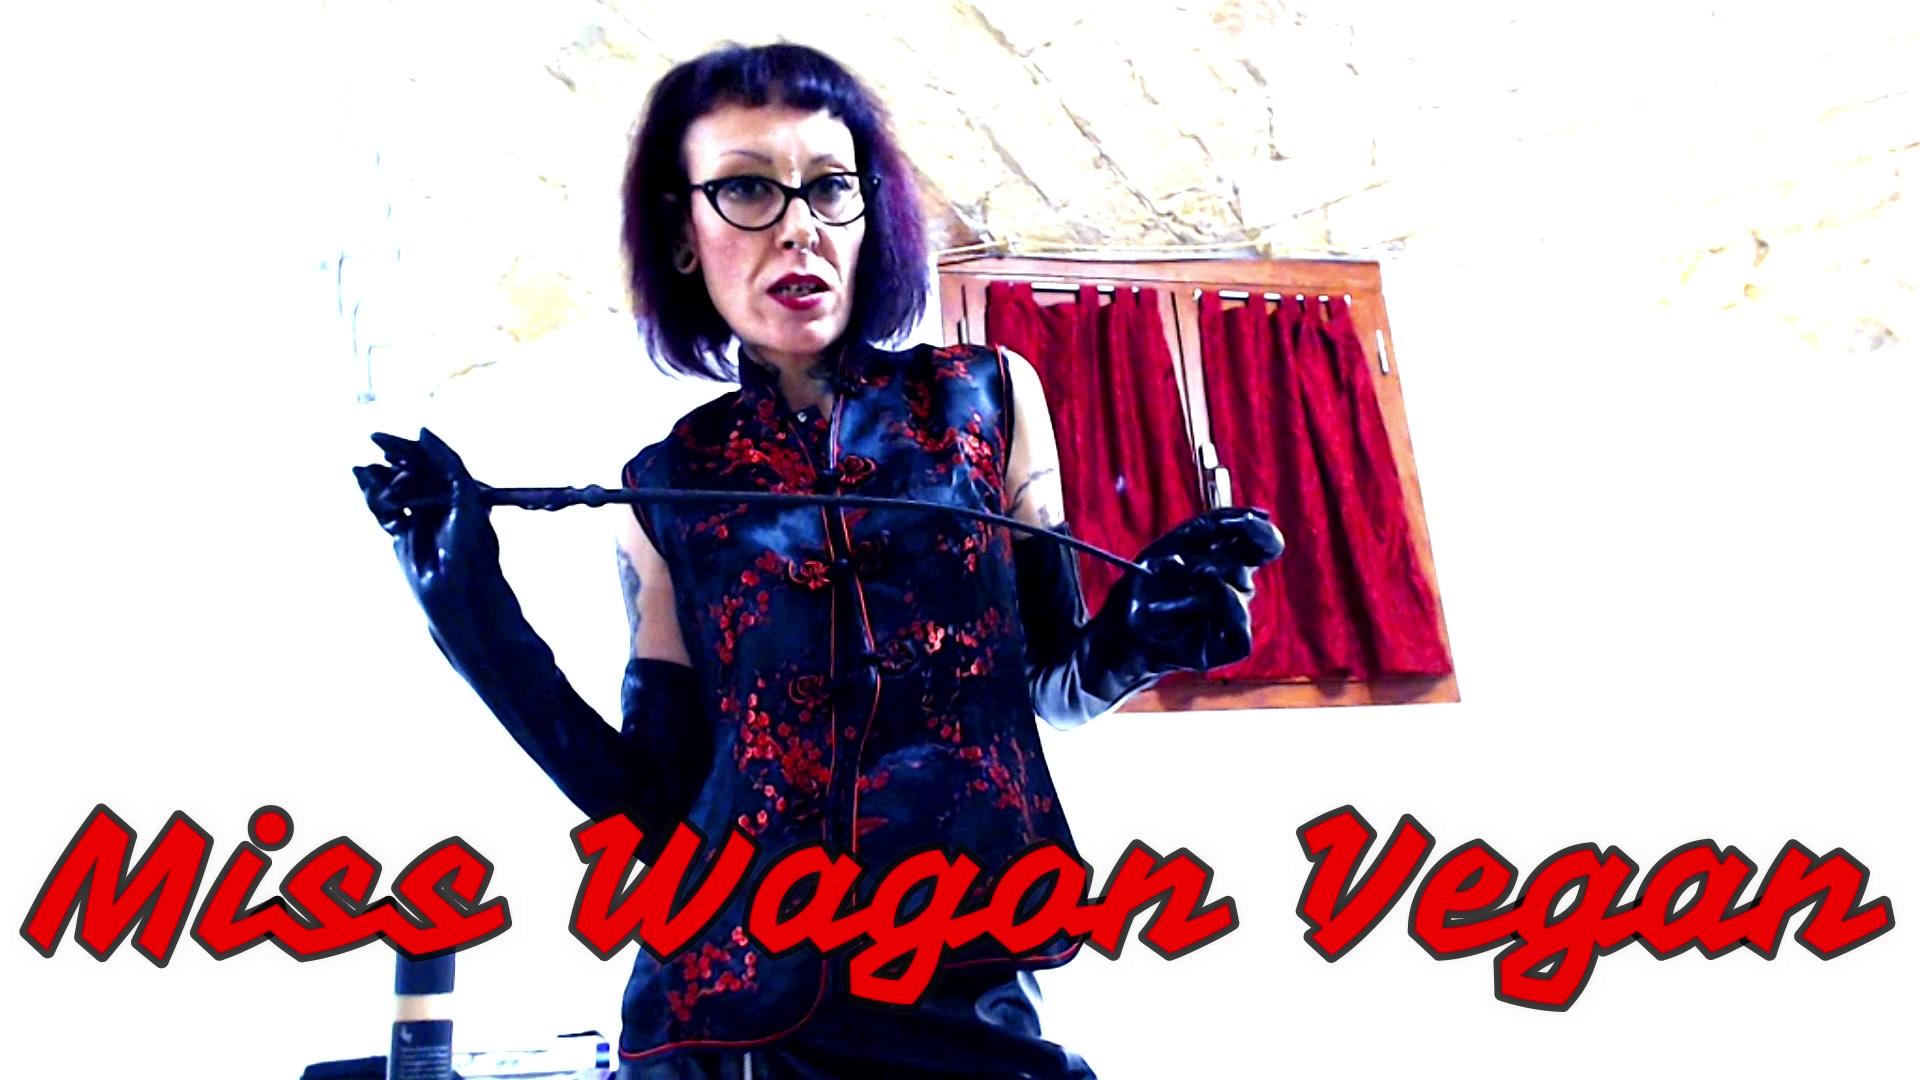 Miss wagon un altro regalo del mio moneyslave andrea rossi - 1 part 2